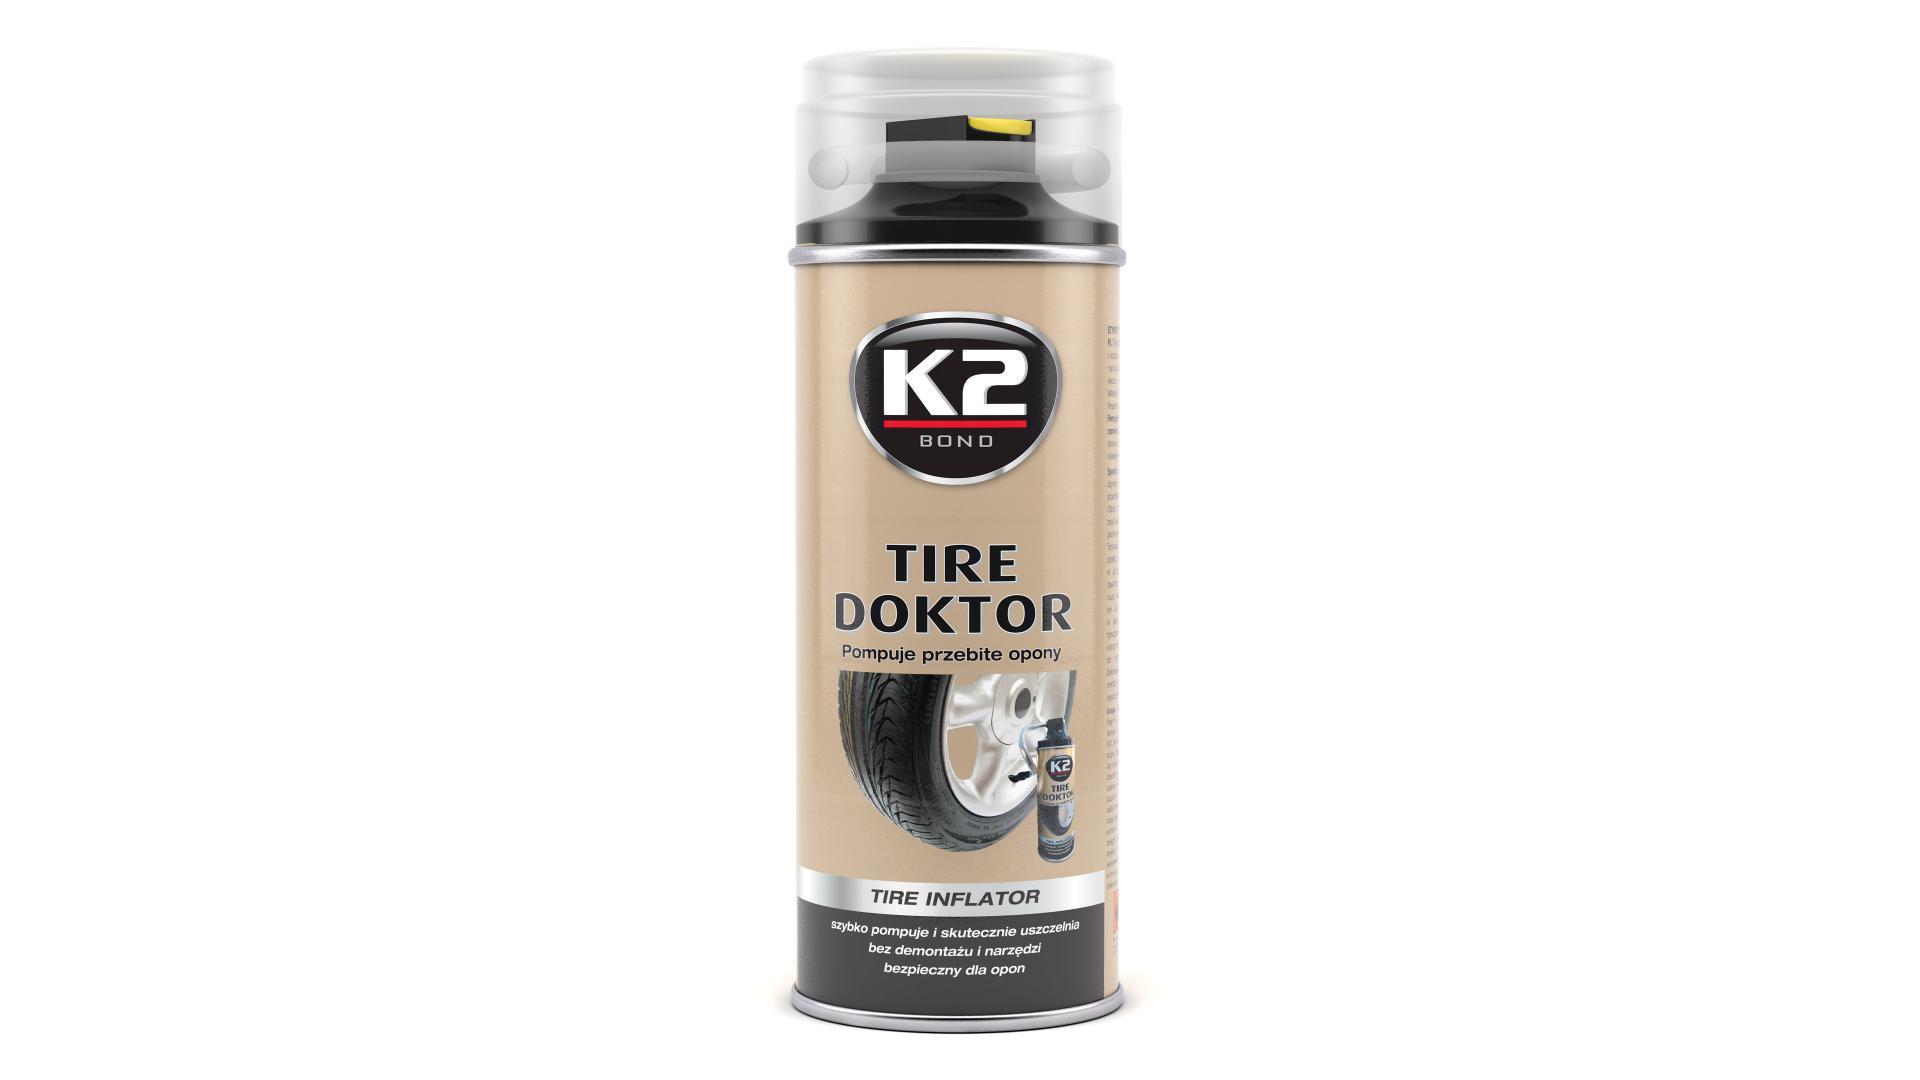 K2 TIRE DOCTOR 400ml